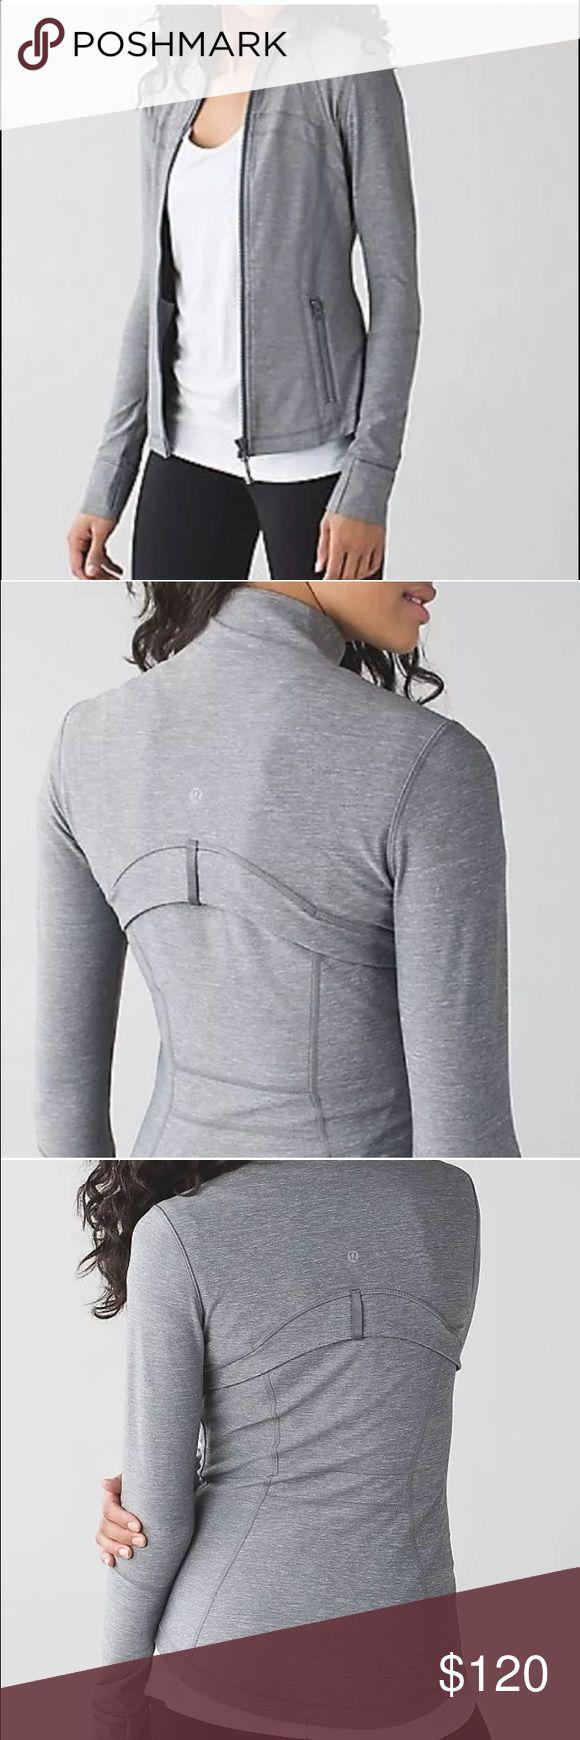 lululemon define jacket heathered grey New no tag. Cheaper on Ⓜ️. NO TRADES lululemon athletica Tops Sweatshirts & Hoodies